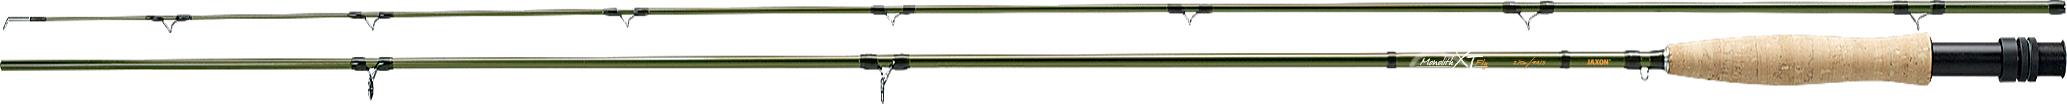 Jaxon - Prut Monolith XT FLY 270cm #4/5 (WJ-MXB2704)